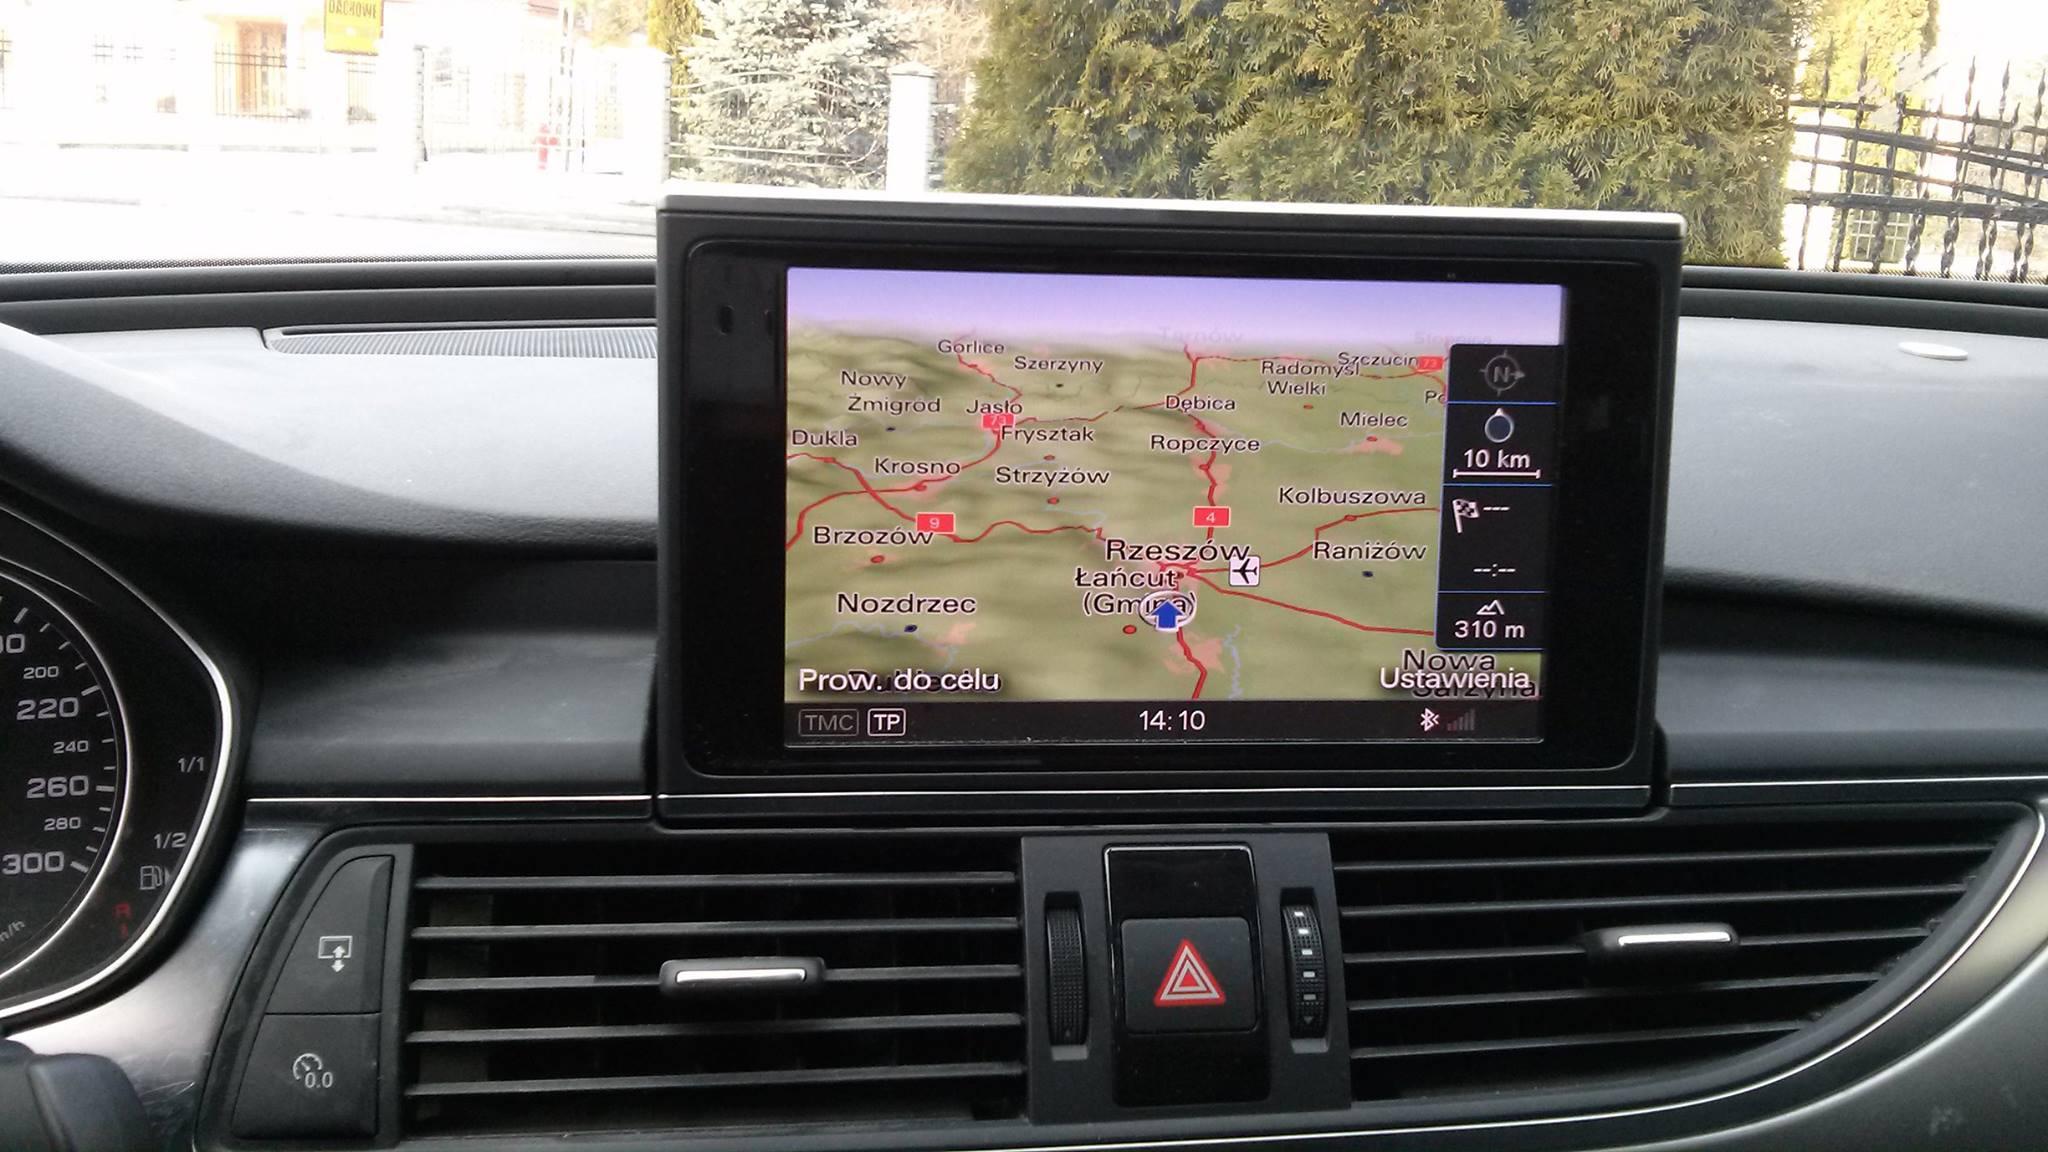 AUDI A6 C7 3.0 V6 TDI QUATTRO